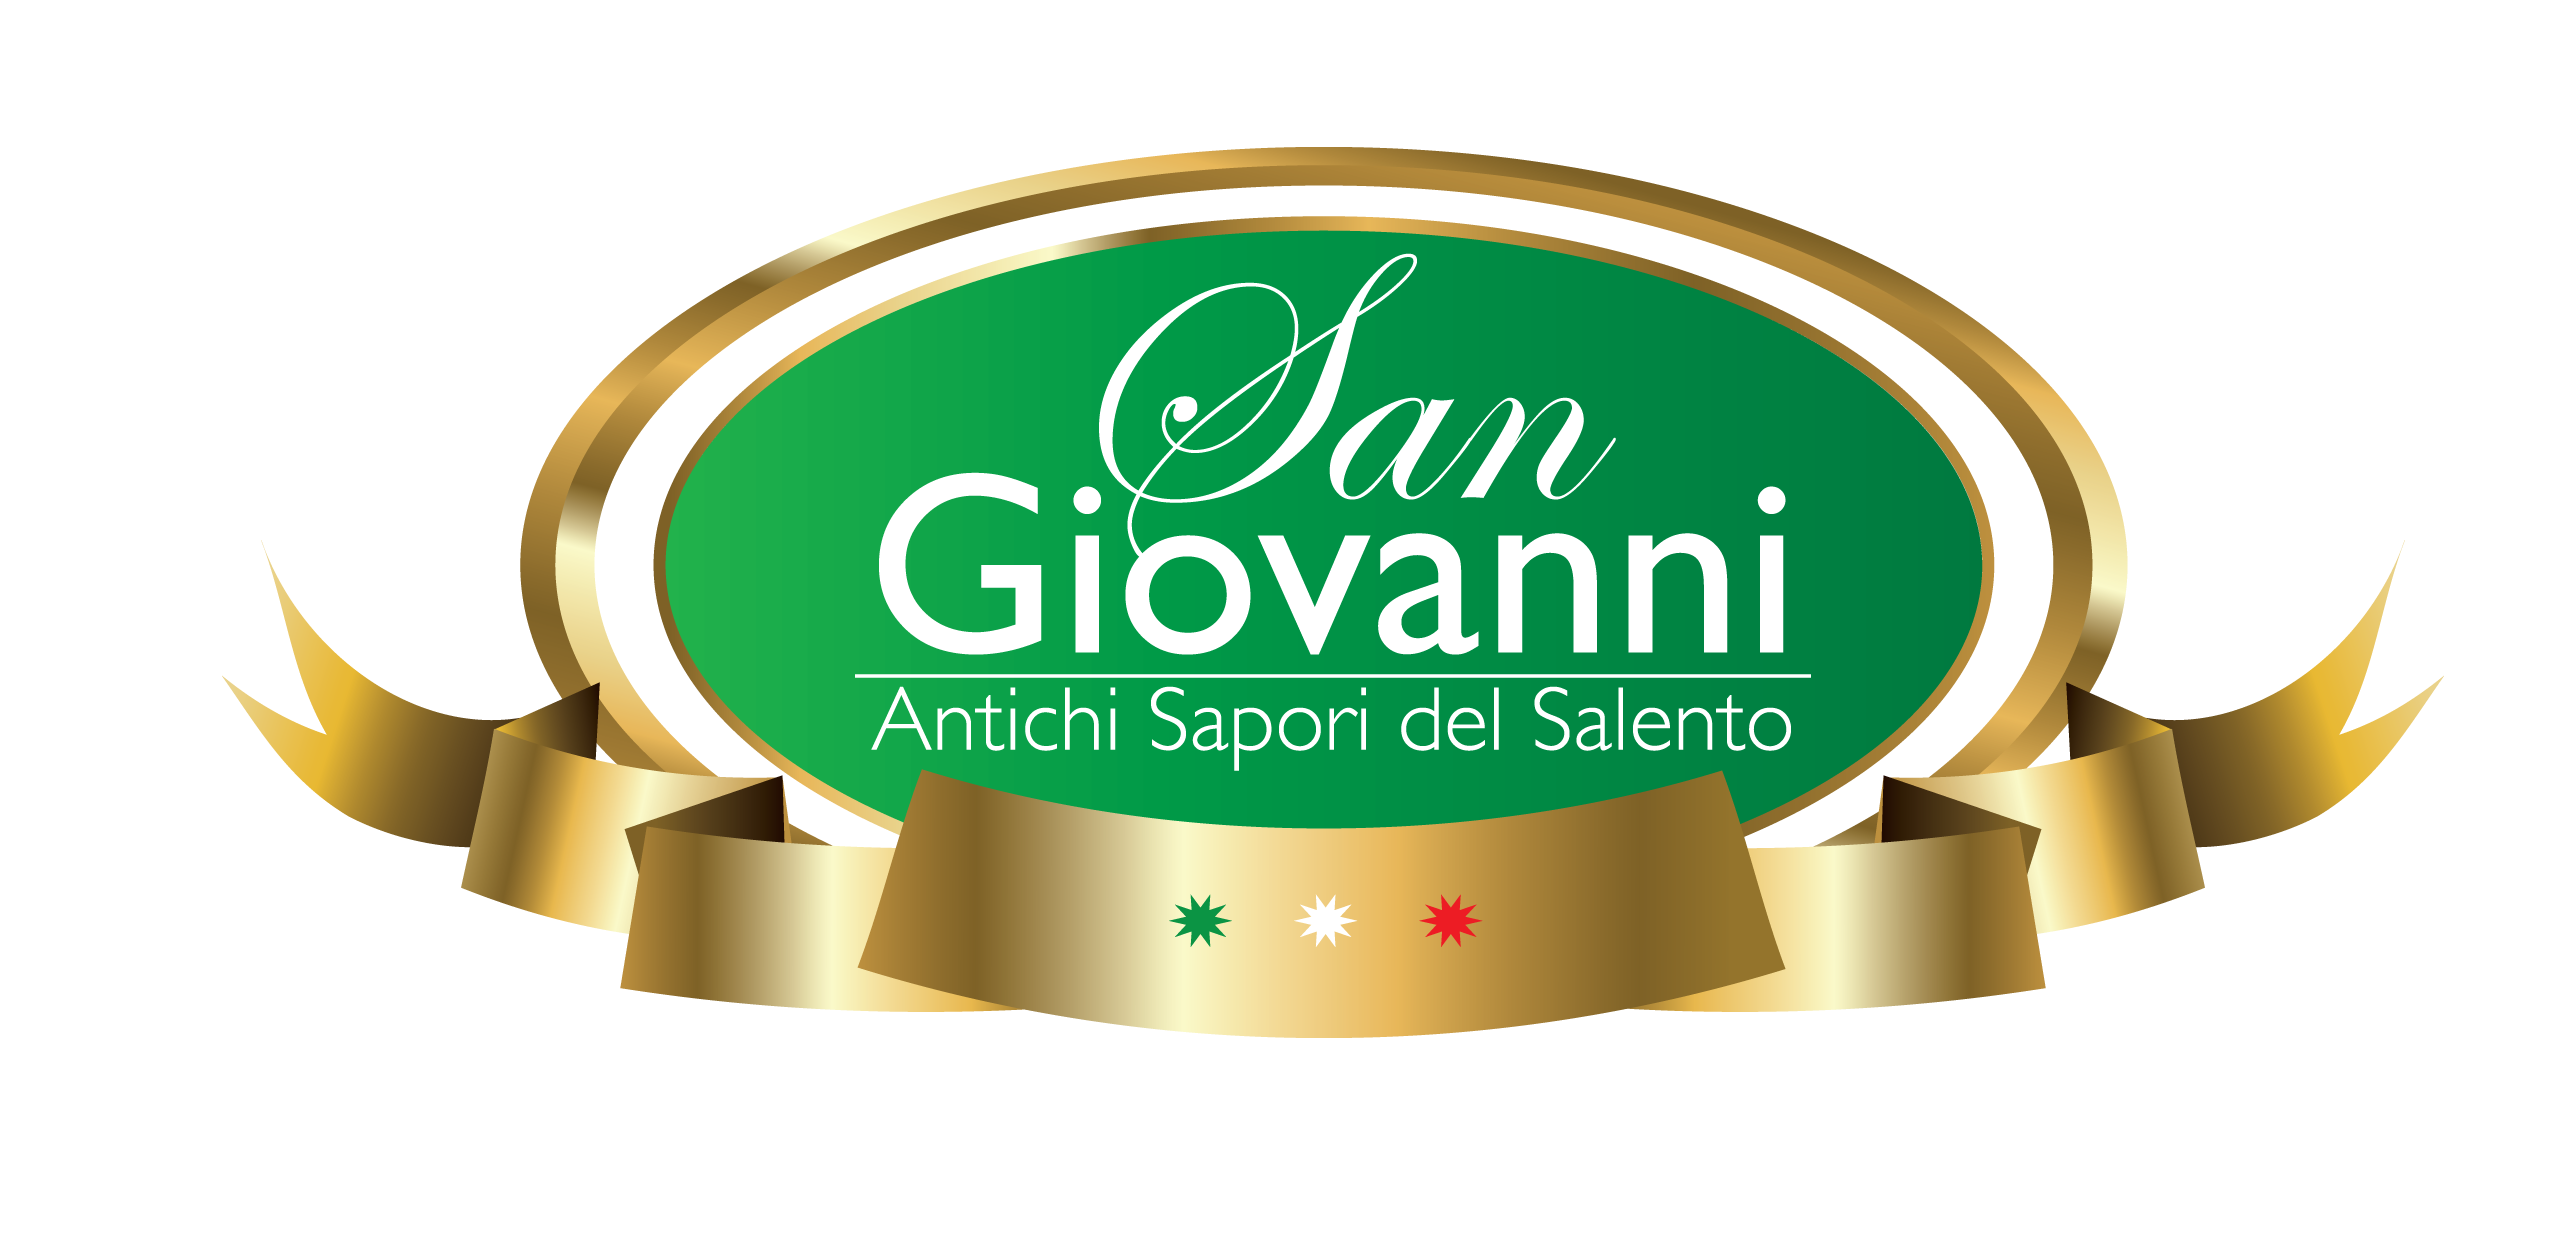 SanGiovanni